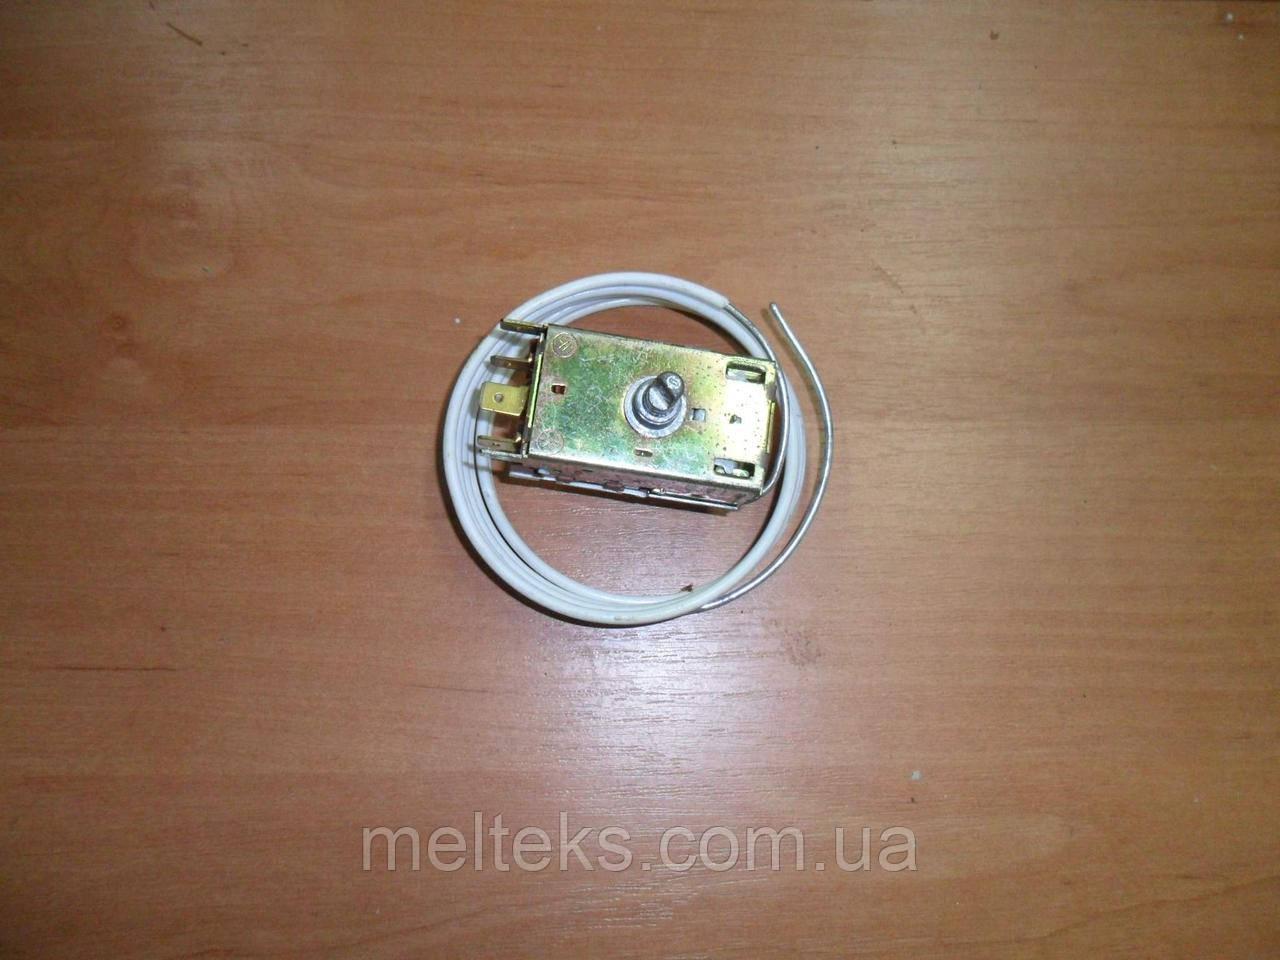 Терморегулятор Ранко К59Р3134, К59Р3136